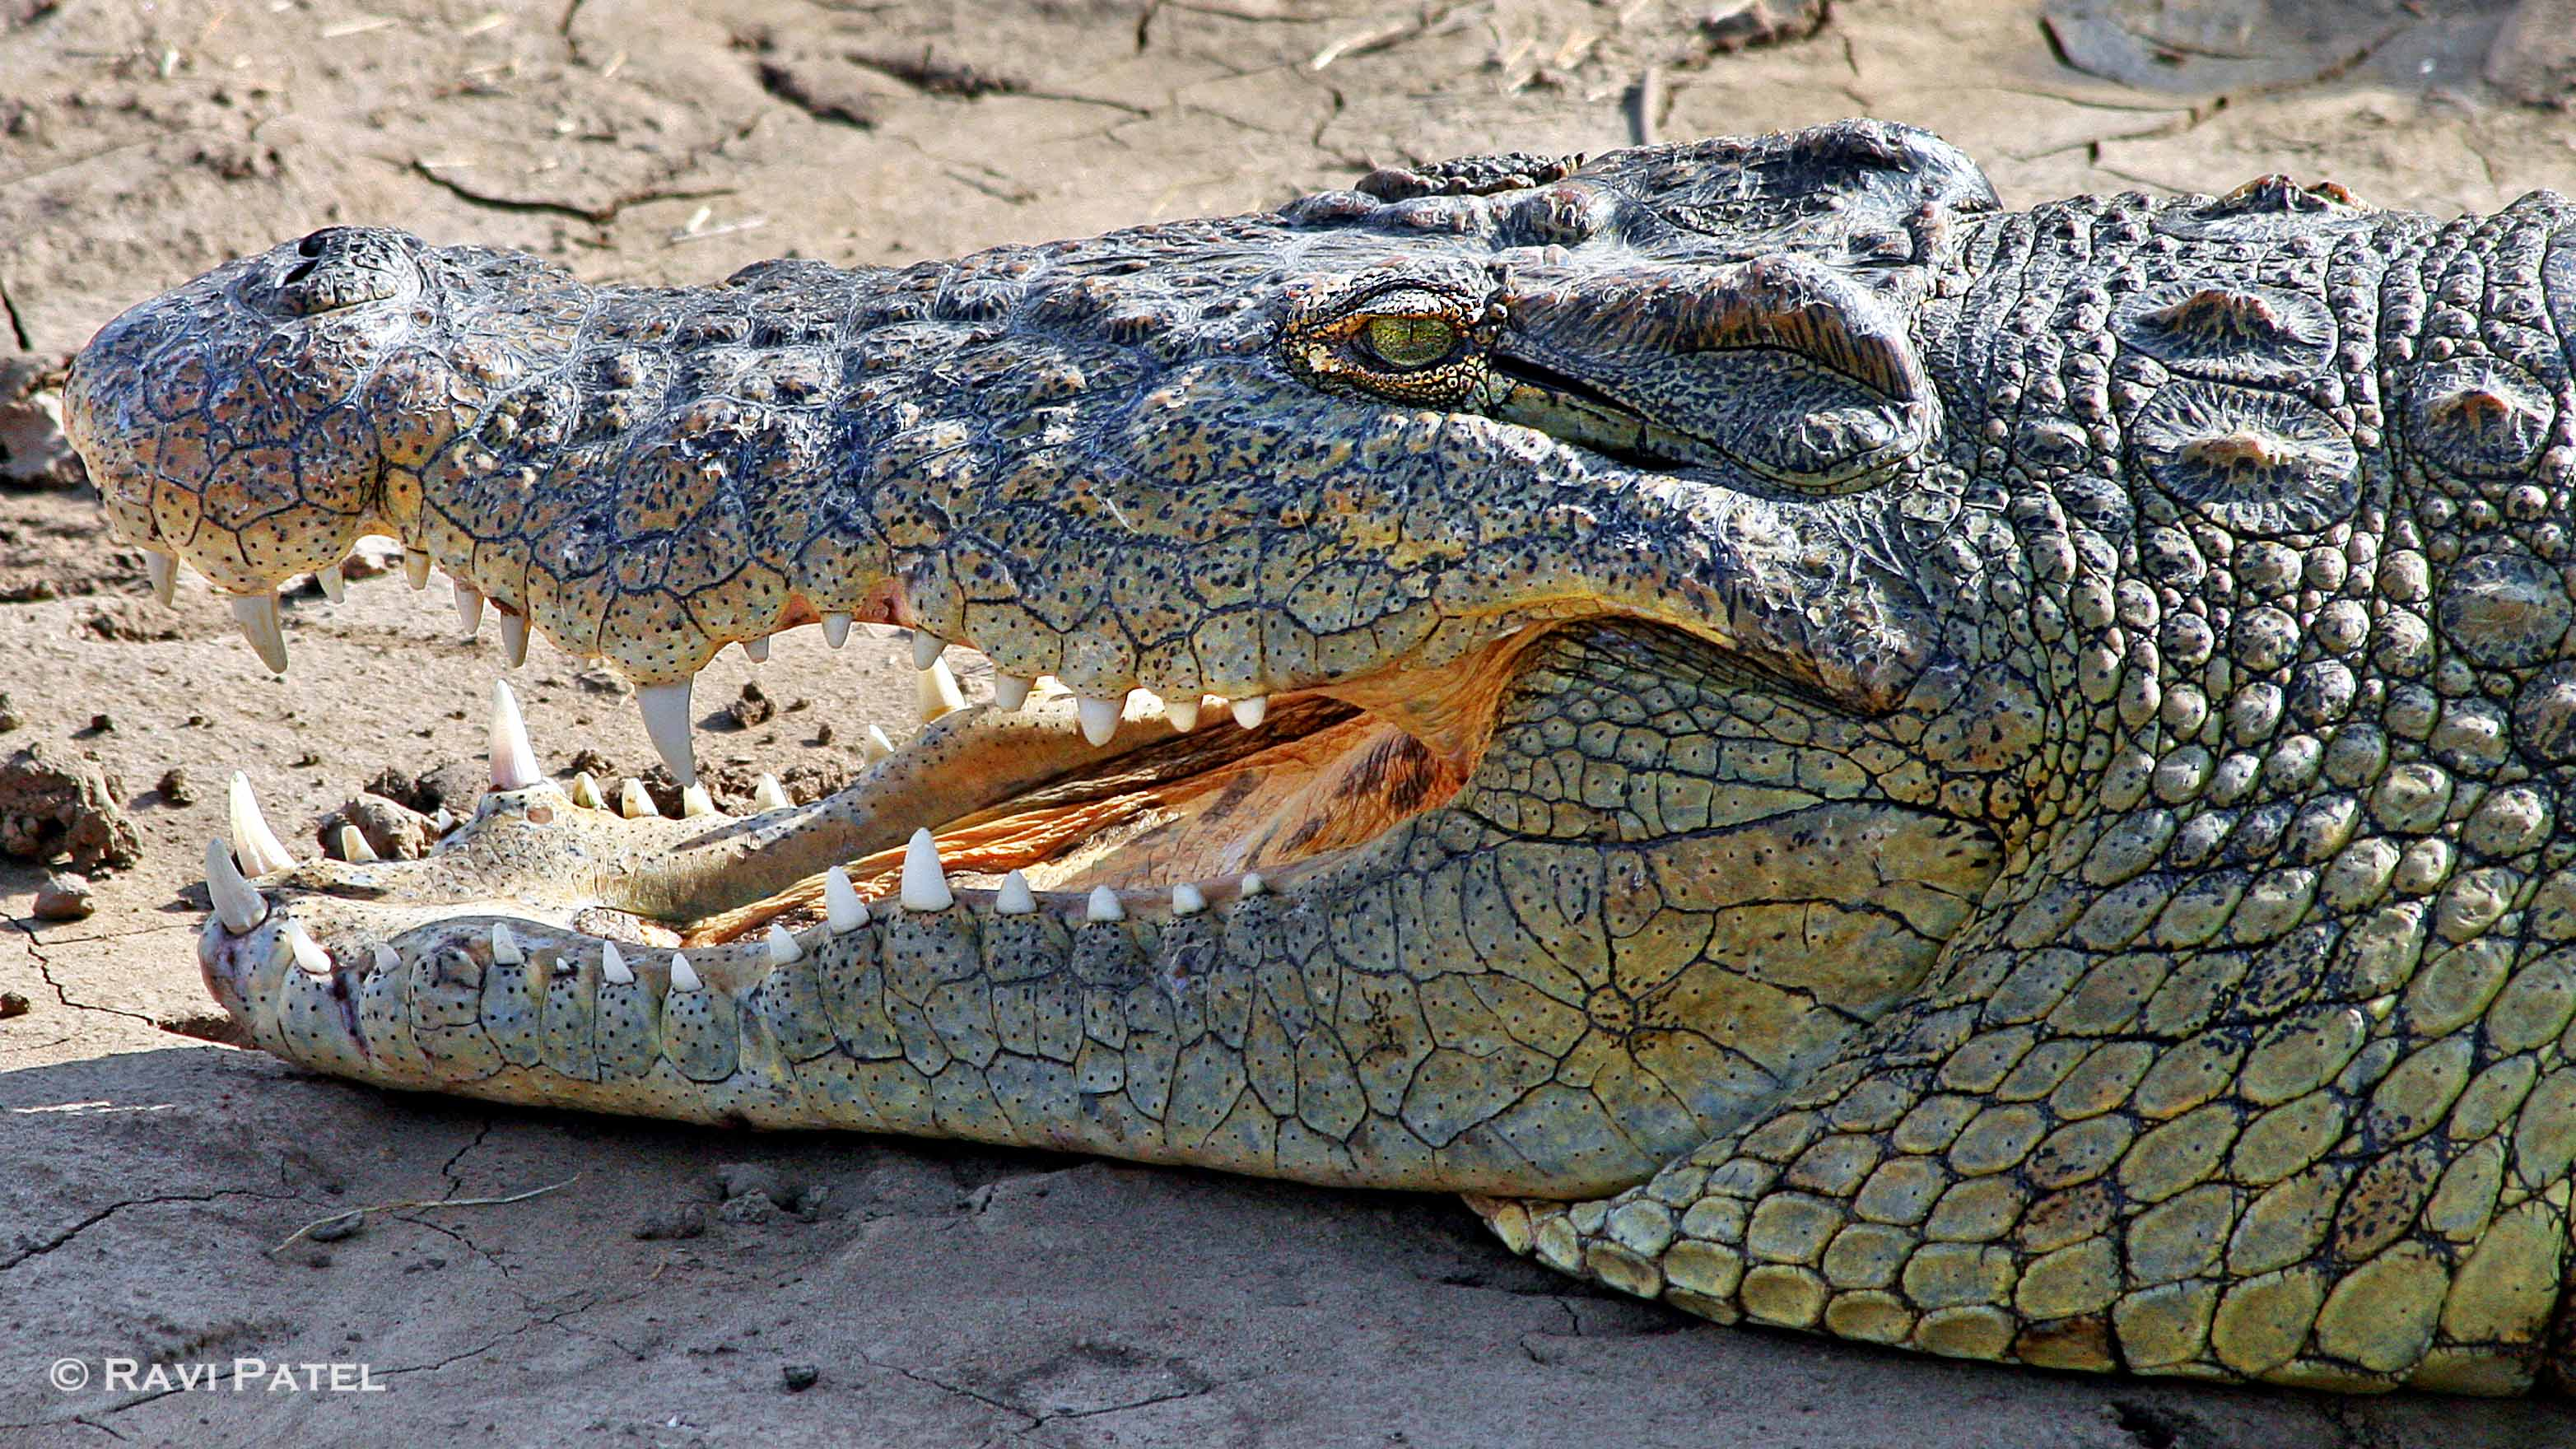 Blue Nile Falls Wallpaper Nile Crocodile Up Close Photos By Ravi